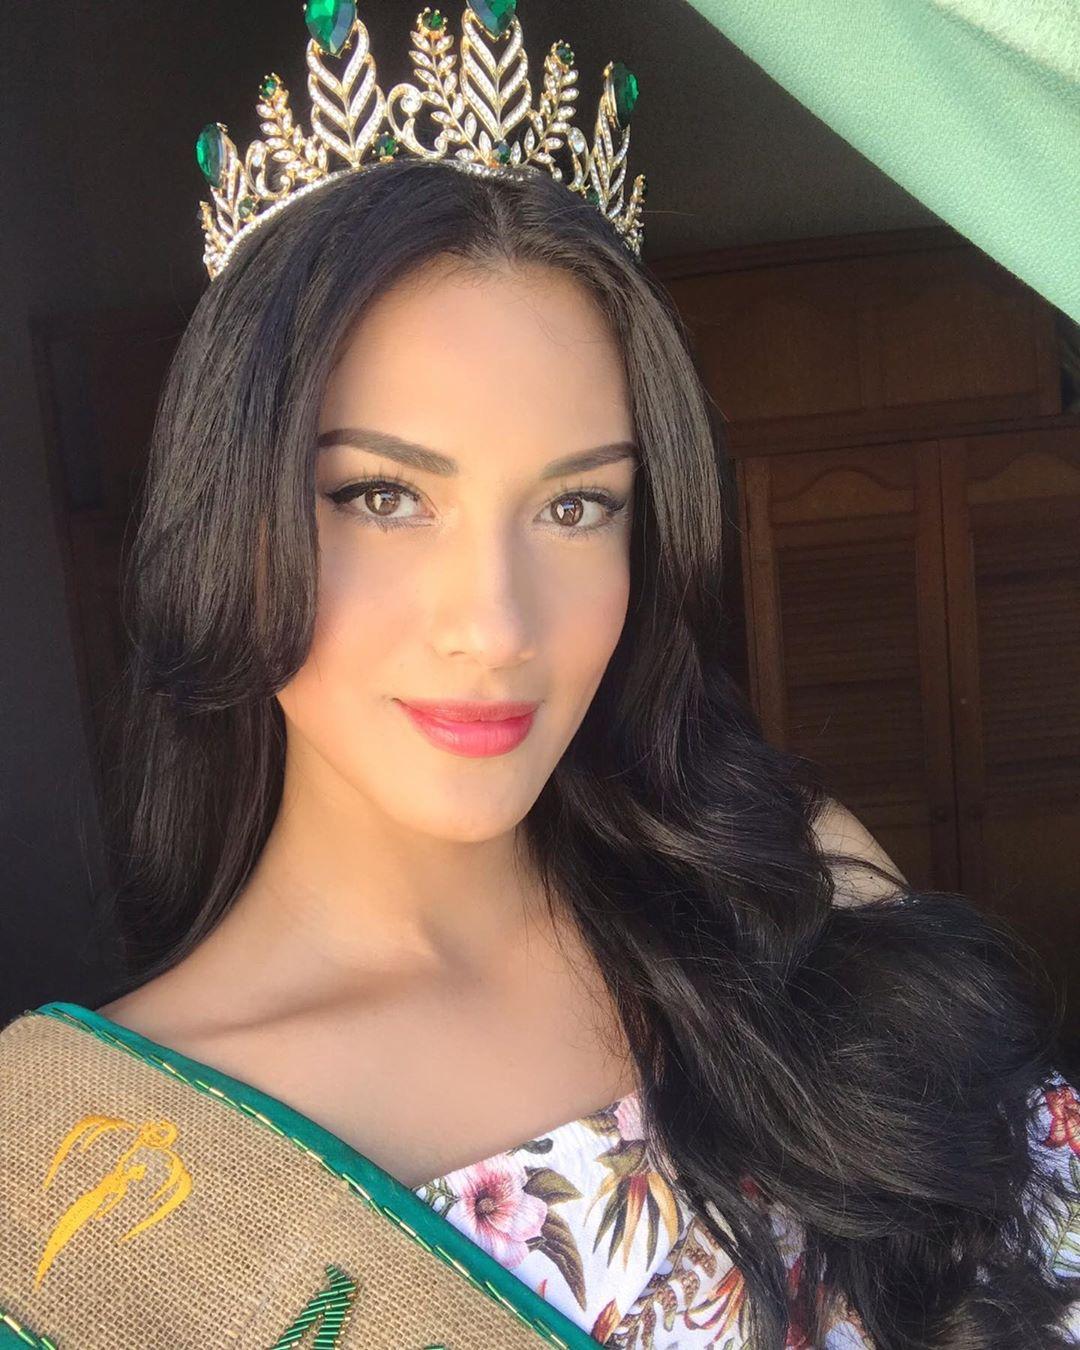 yenny katherine carrillo, top 20 de miss earth 2019/reyna mundial banano 2017. - Página 4 67833510